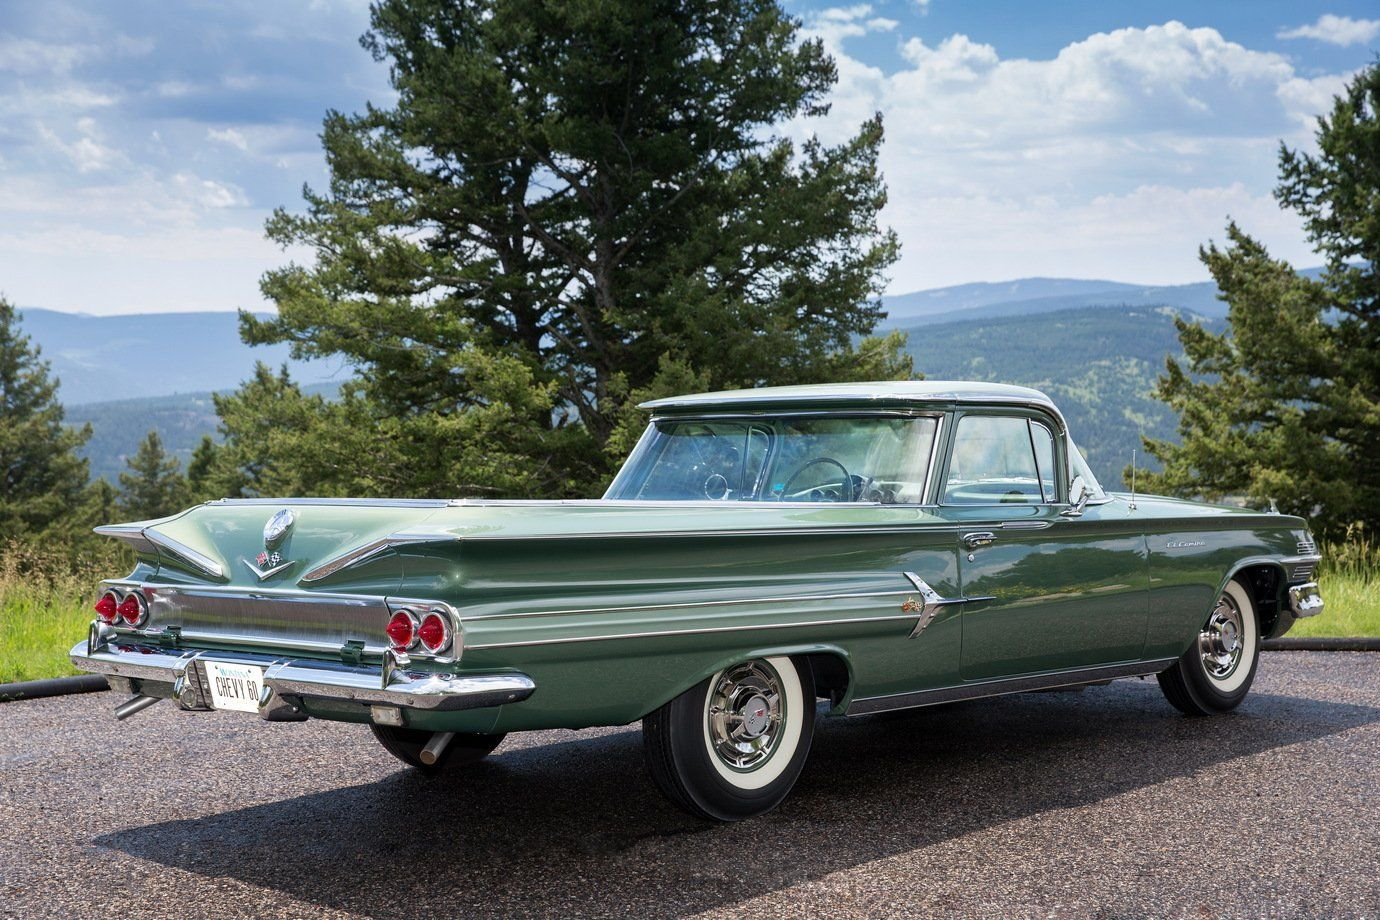 1960 Chevy El Camino Classic Cars Trucks Hot Rods Classic Cars